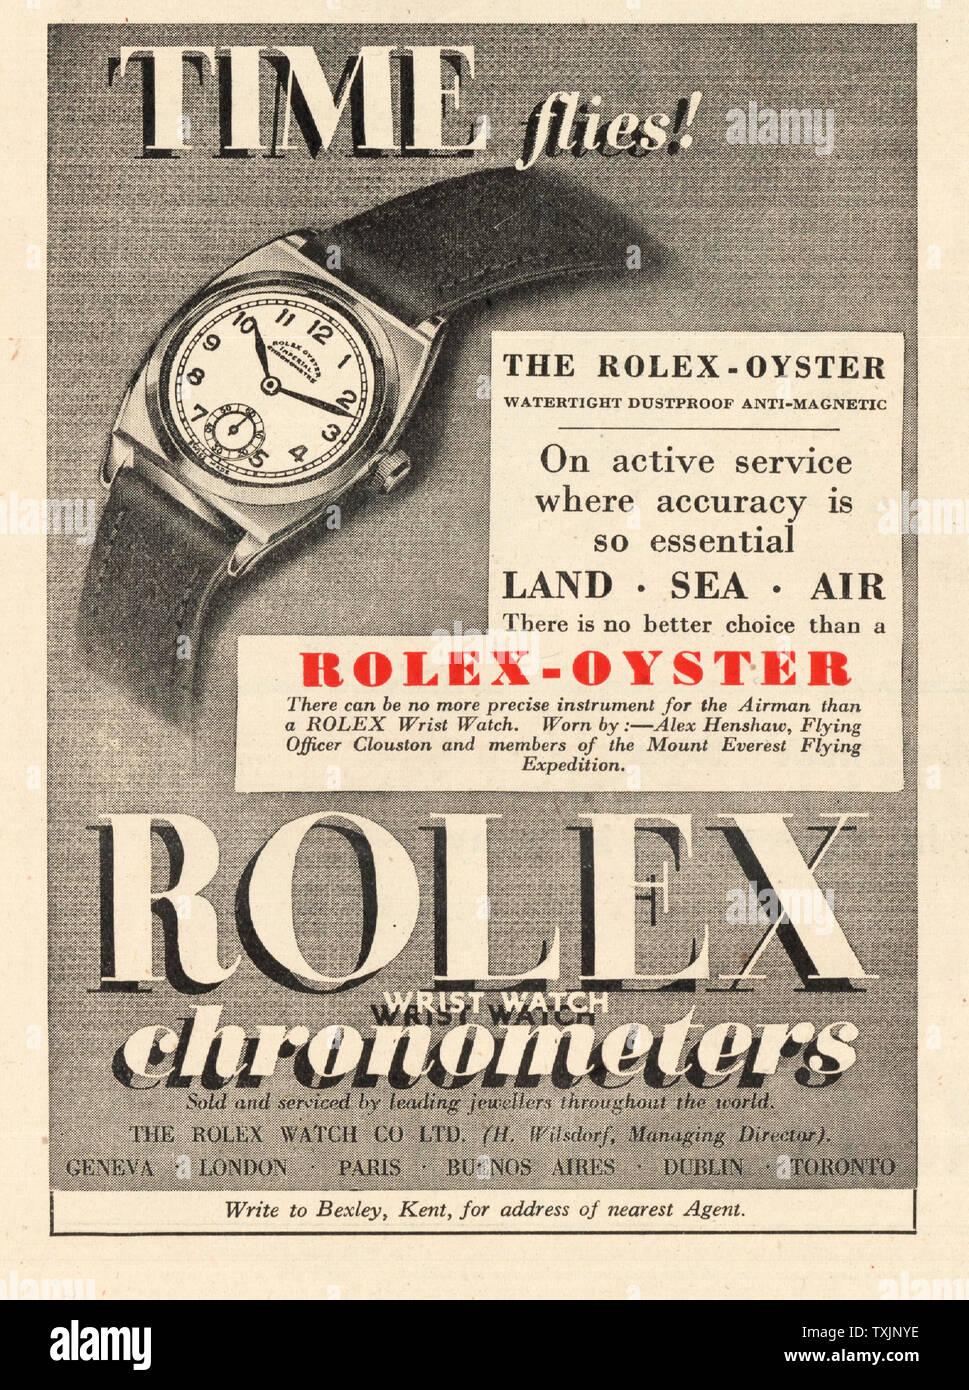 1947 UK Magazine Rolex-Oyster Watches Advert Stock Photo